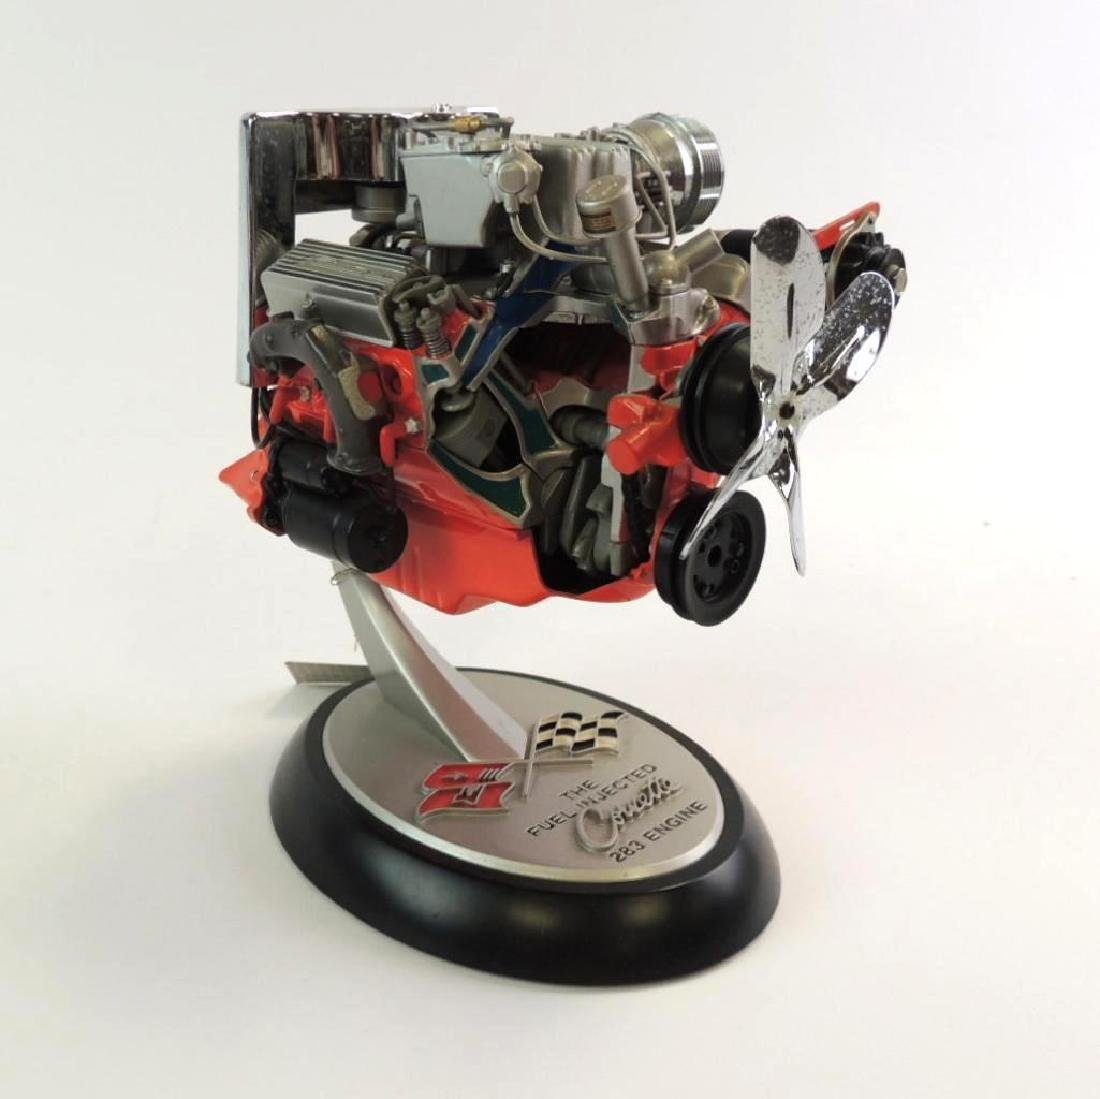 Franklin Mint Corvette 283 Die-Cast Engine Model